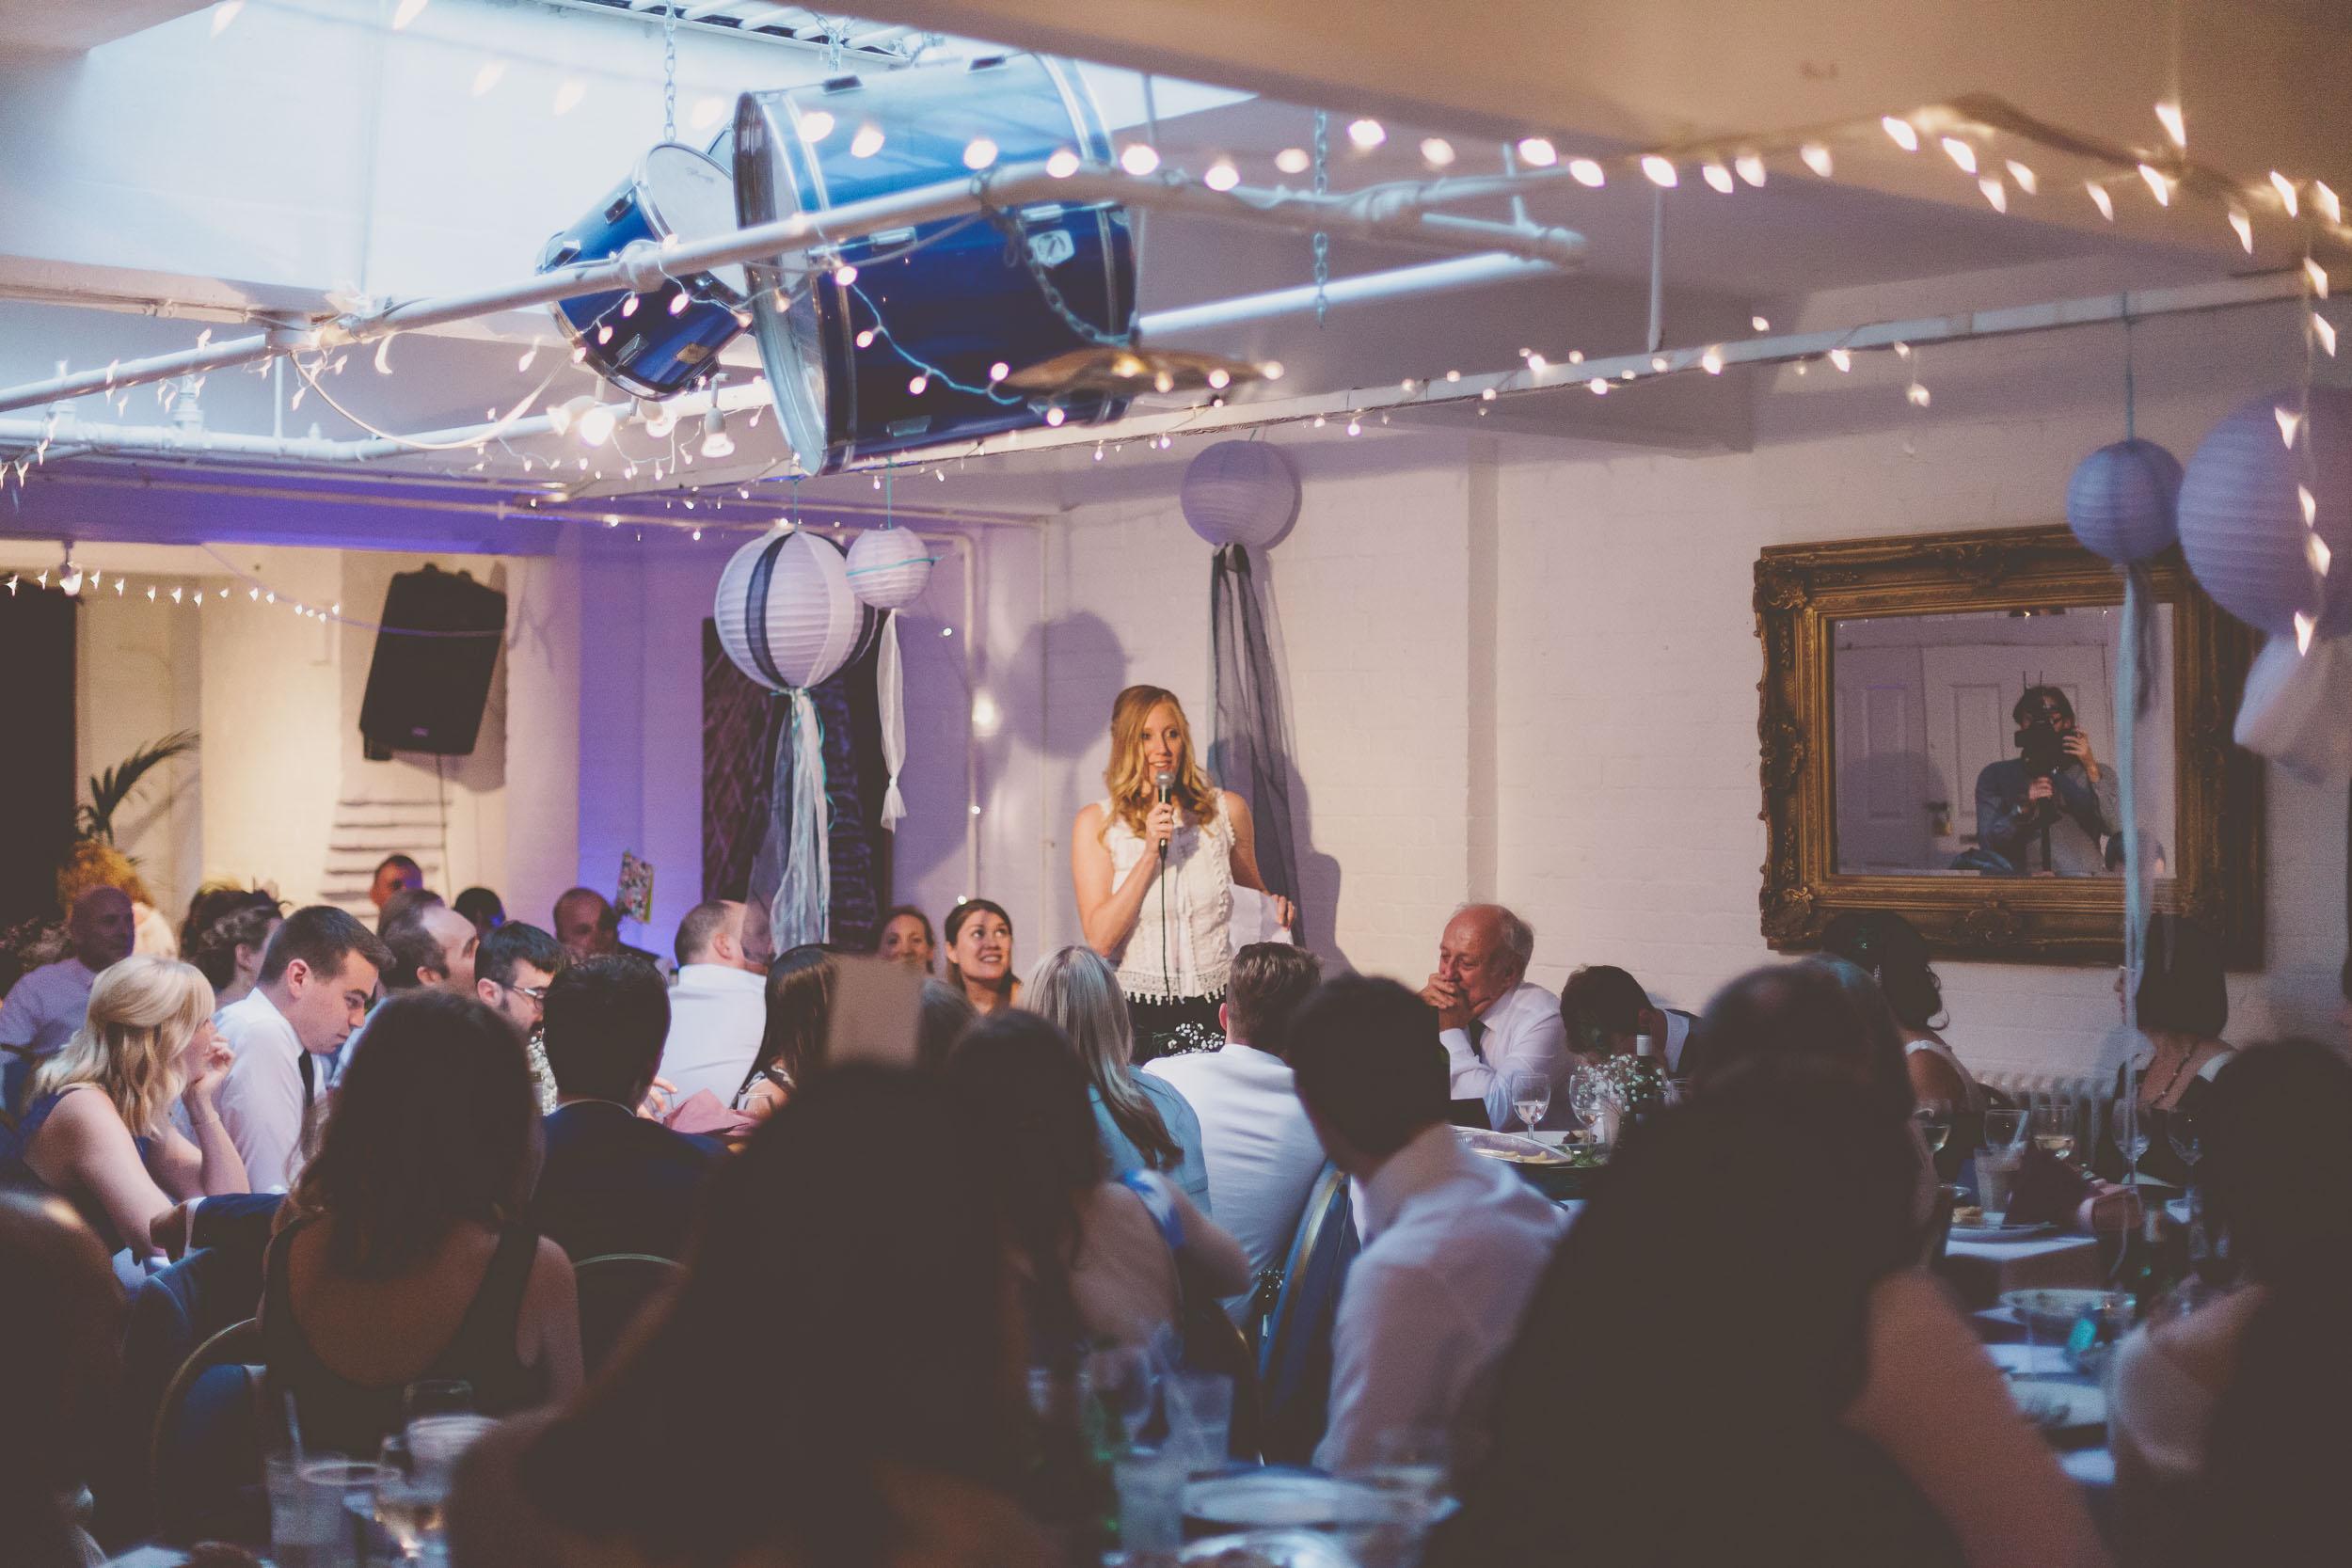 islington-town-hall-4th-floor-studios-wedding386.jpg